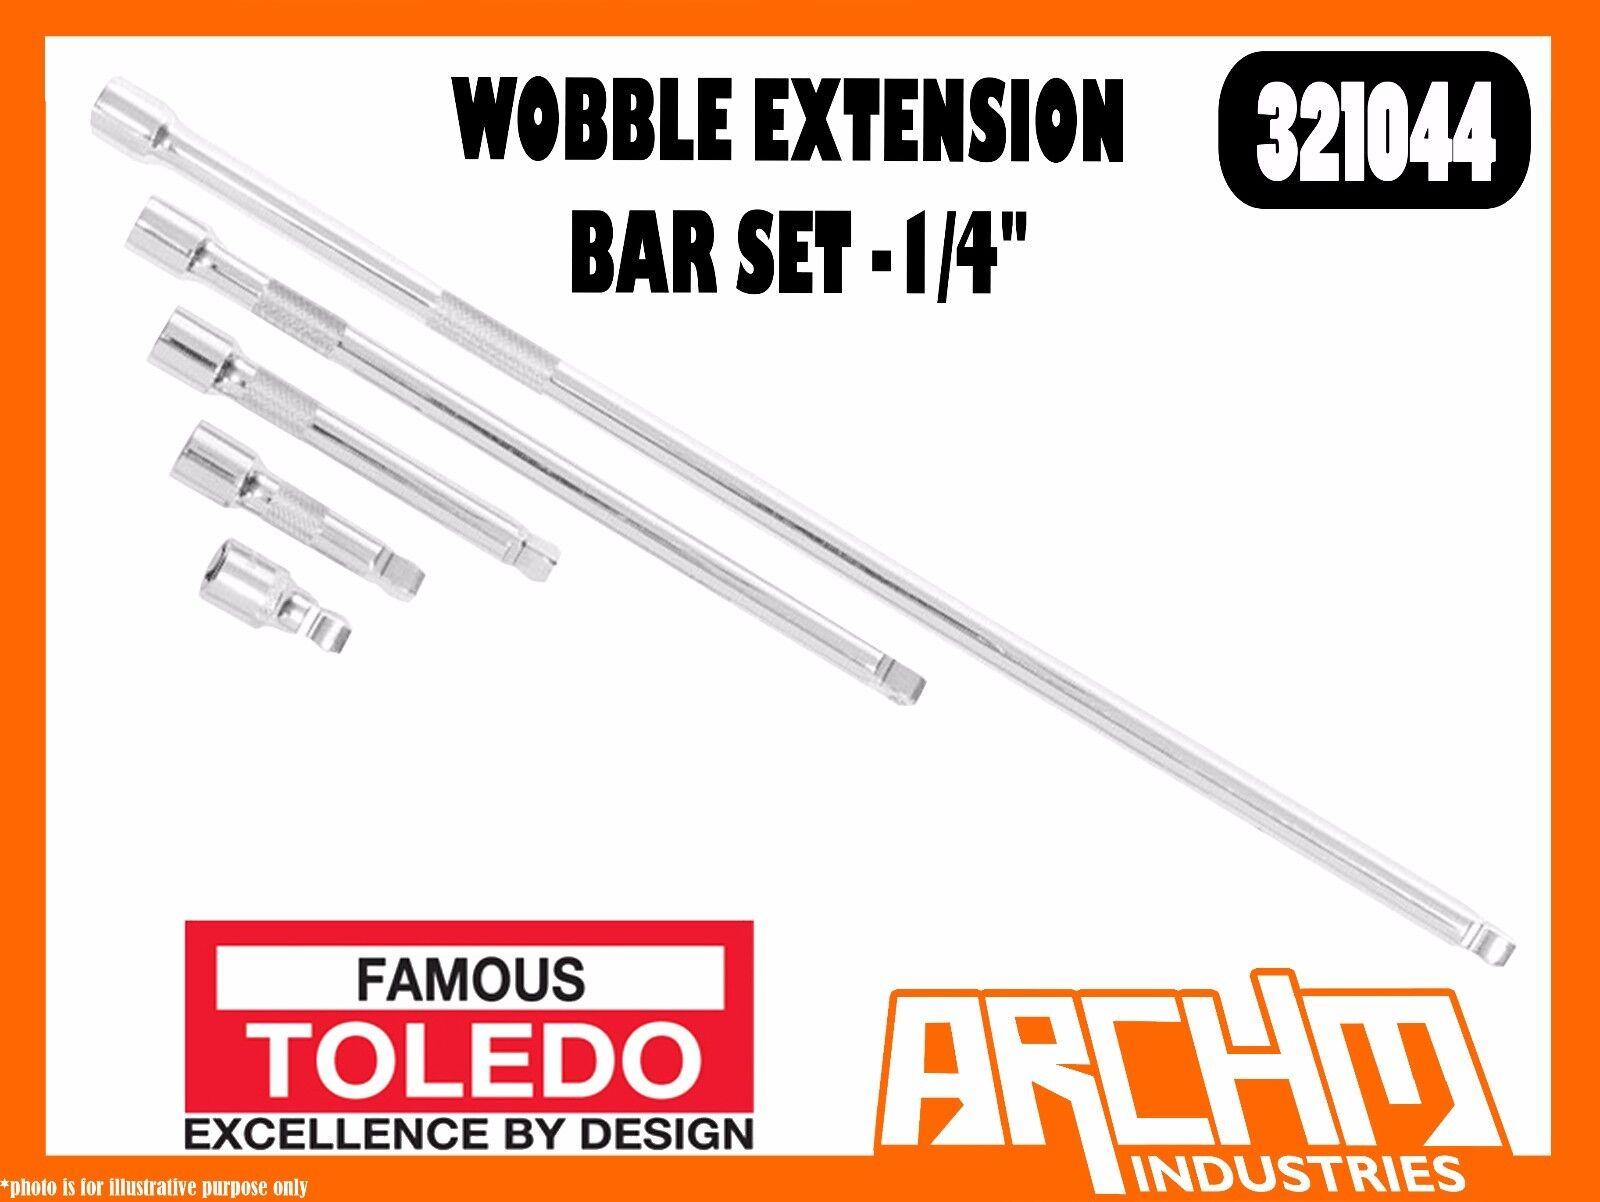 TOLEDO 321044 - WOBBLE EXTENSION BAR SET -1 4  - 50   75   150   250   450MM